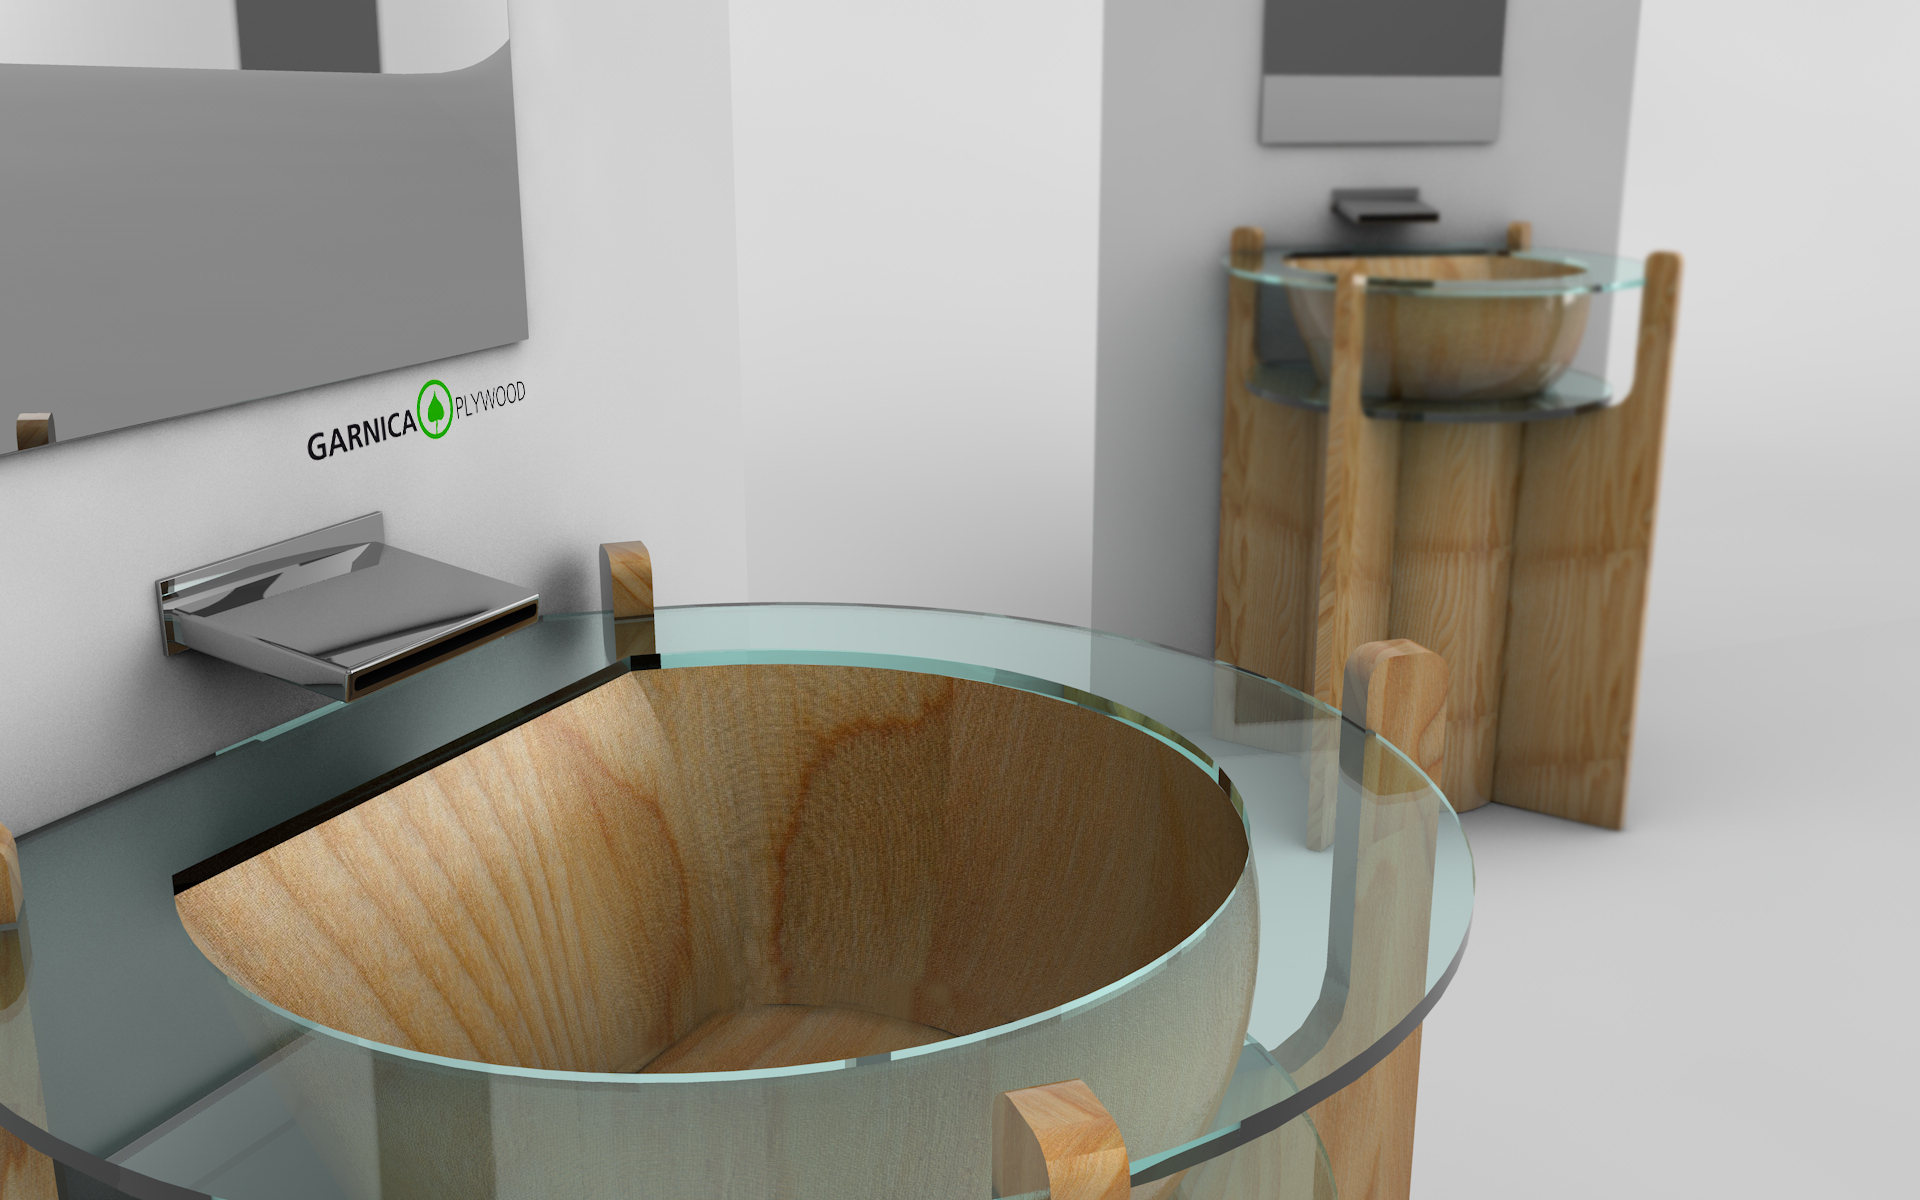 lavabo garnica plywood domestika. Black Bedroom Furniture Sets. Home Design Ideas